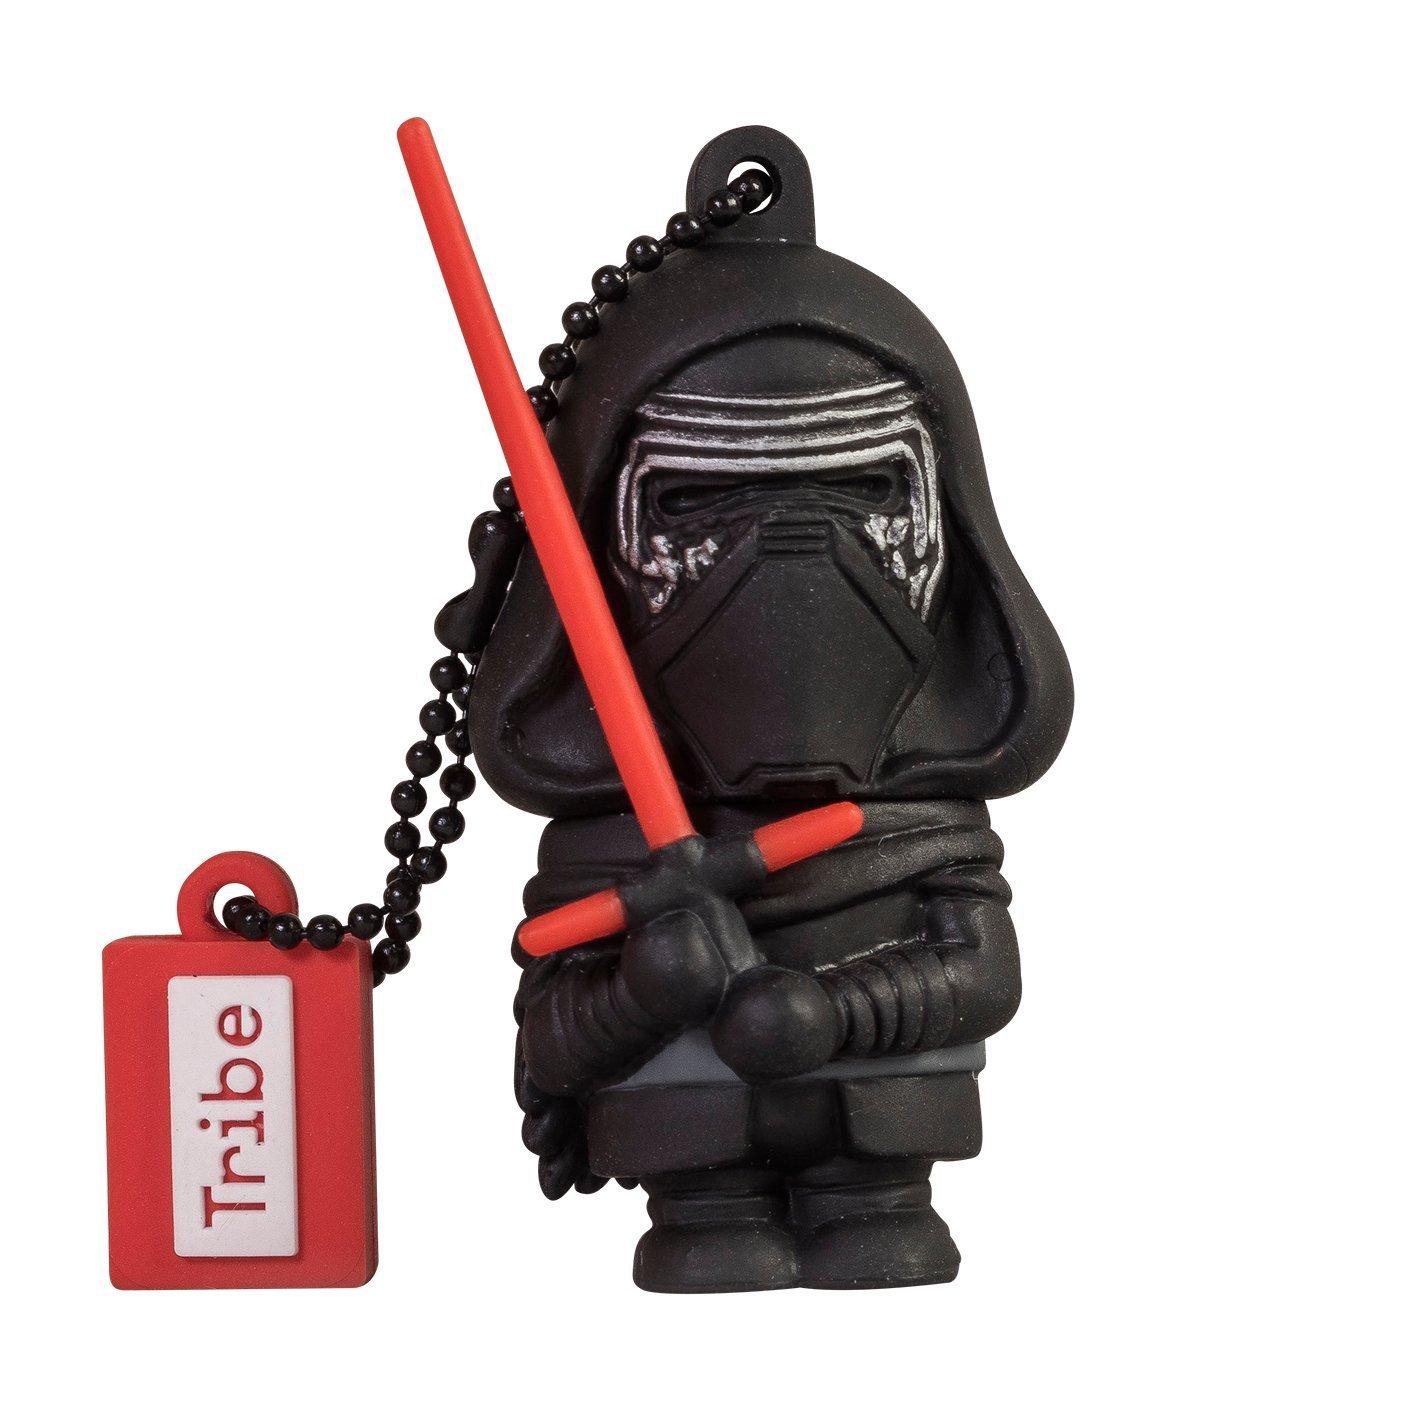 USB flash disk 16GB - Tribe, Star Wars Kylo Ren